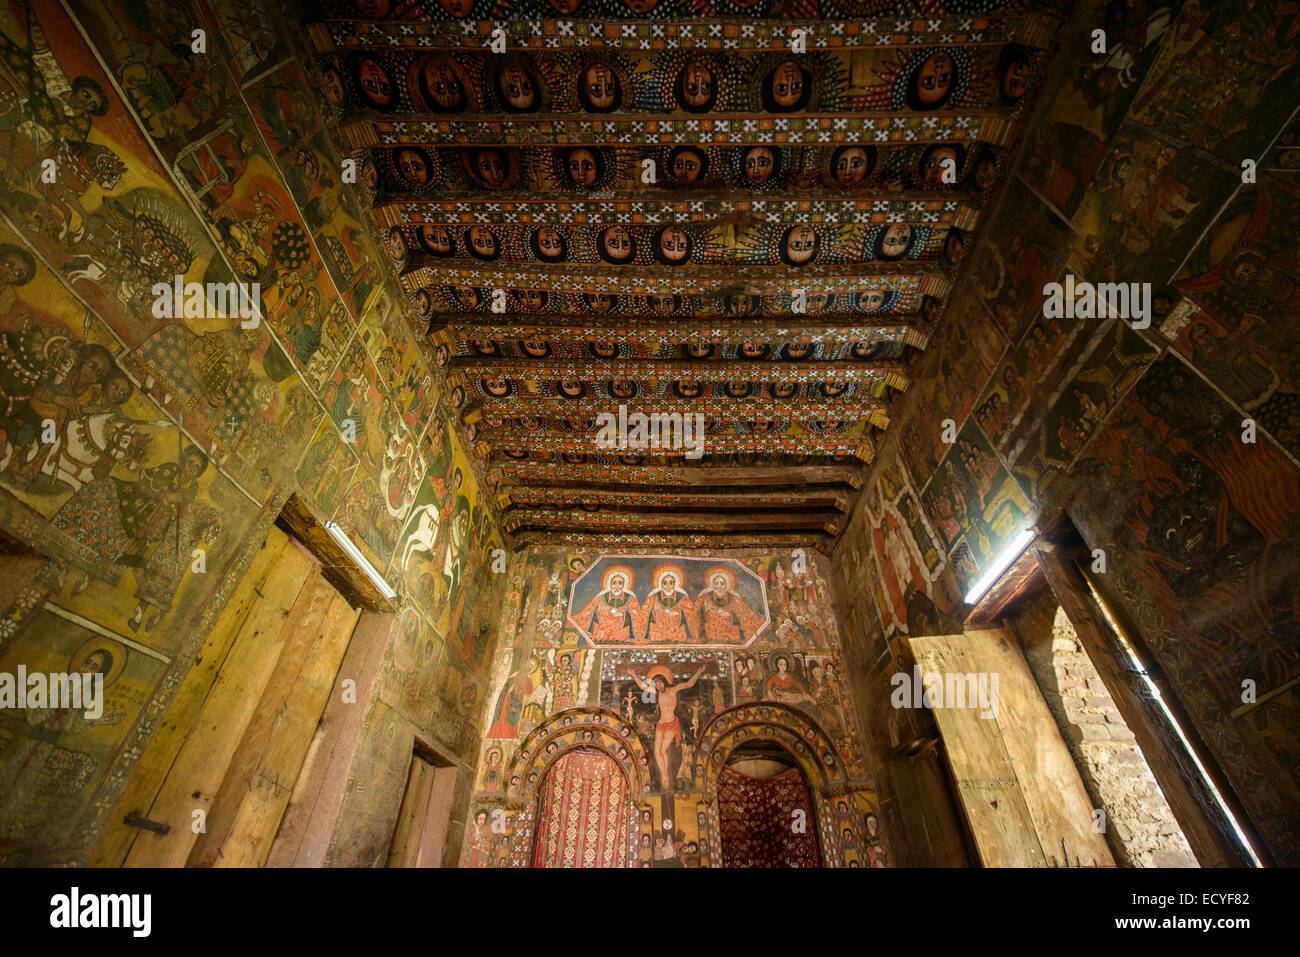 Debre Birhan Selassie church, Gondar, Ethiopia - Stock Image